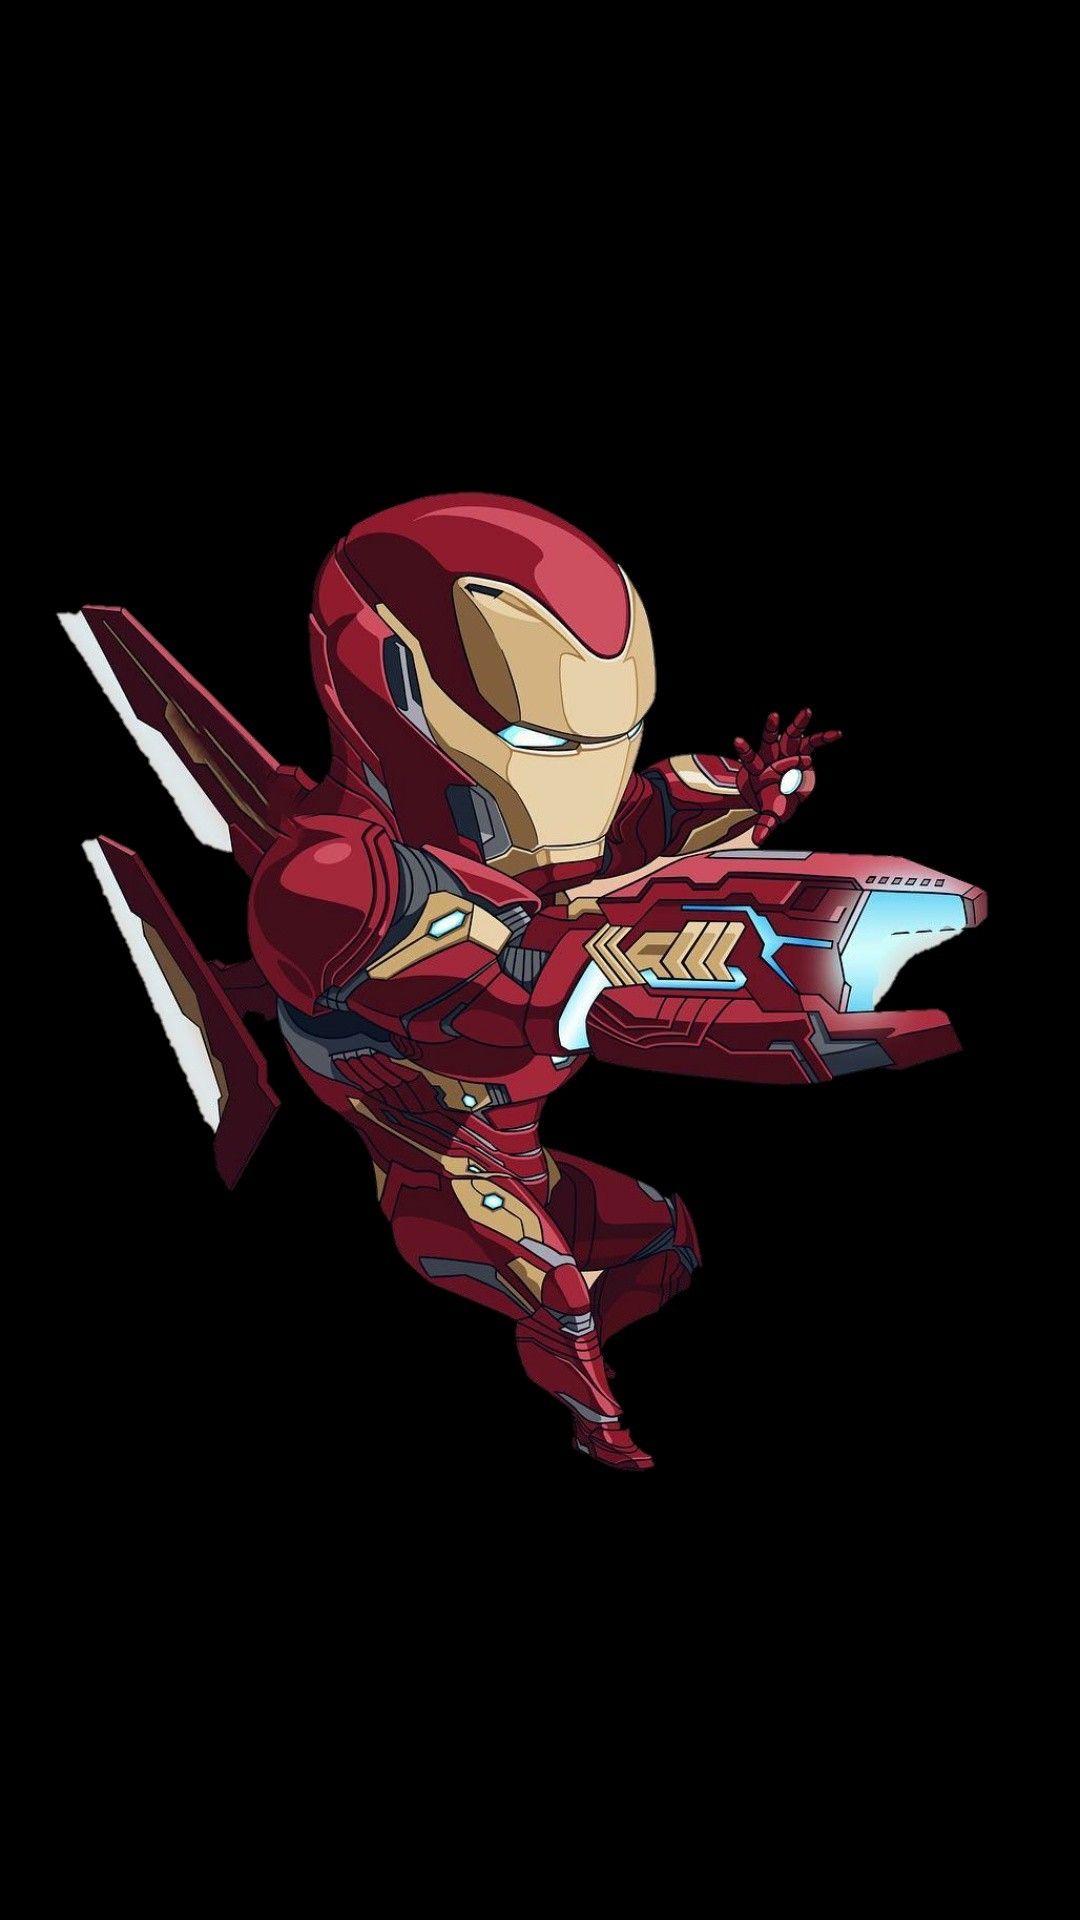 Iron Man Wallpaper 36 Iron Man Marvel Iron Man Avengers